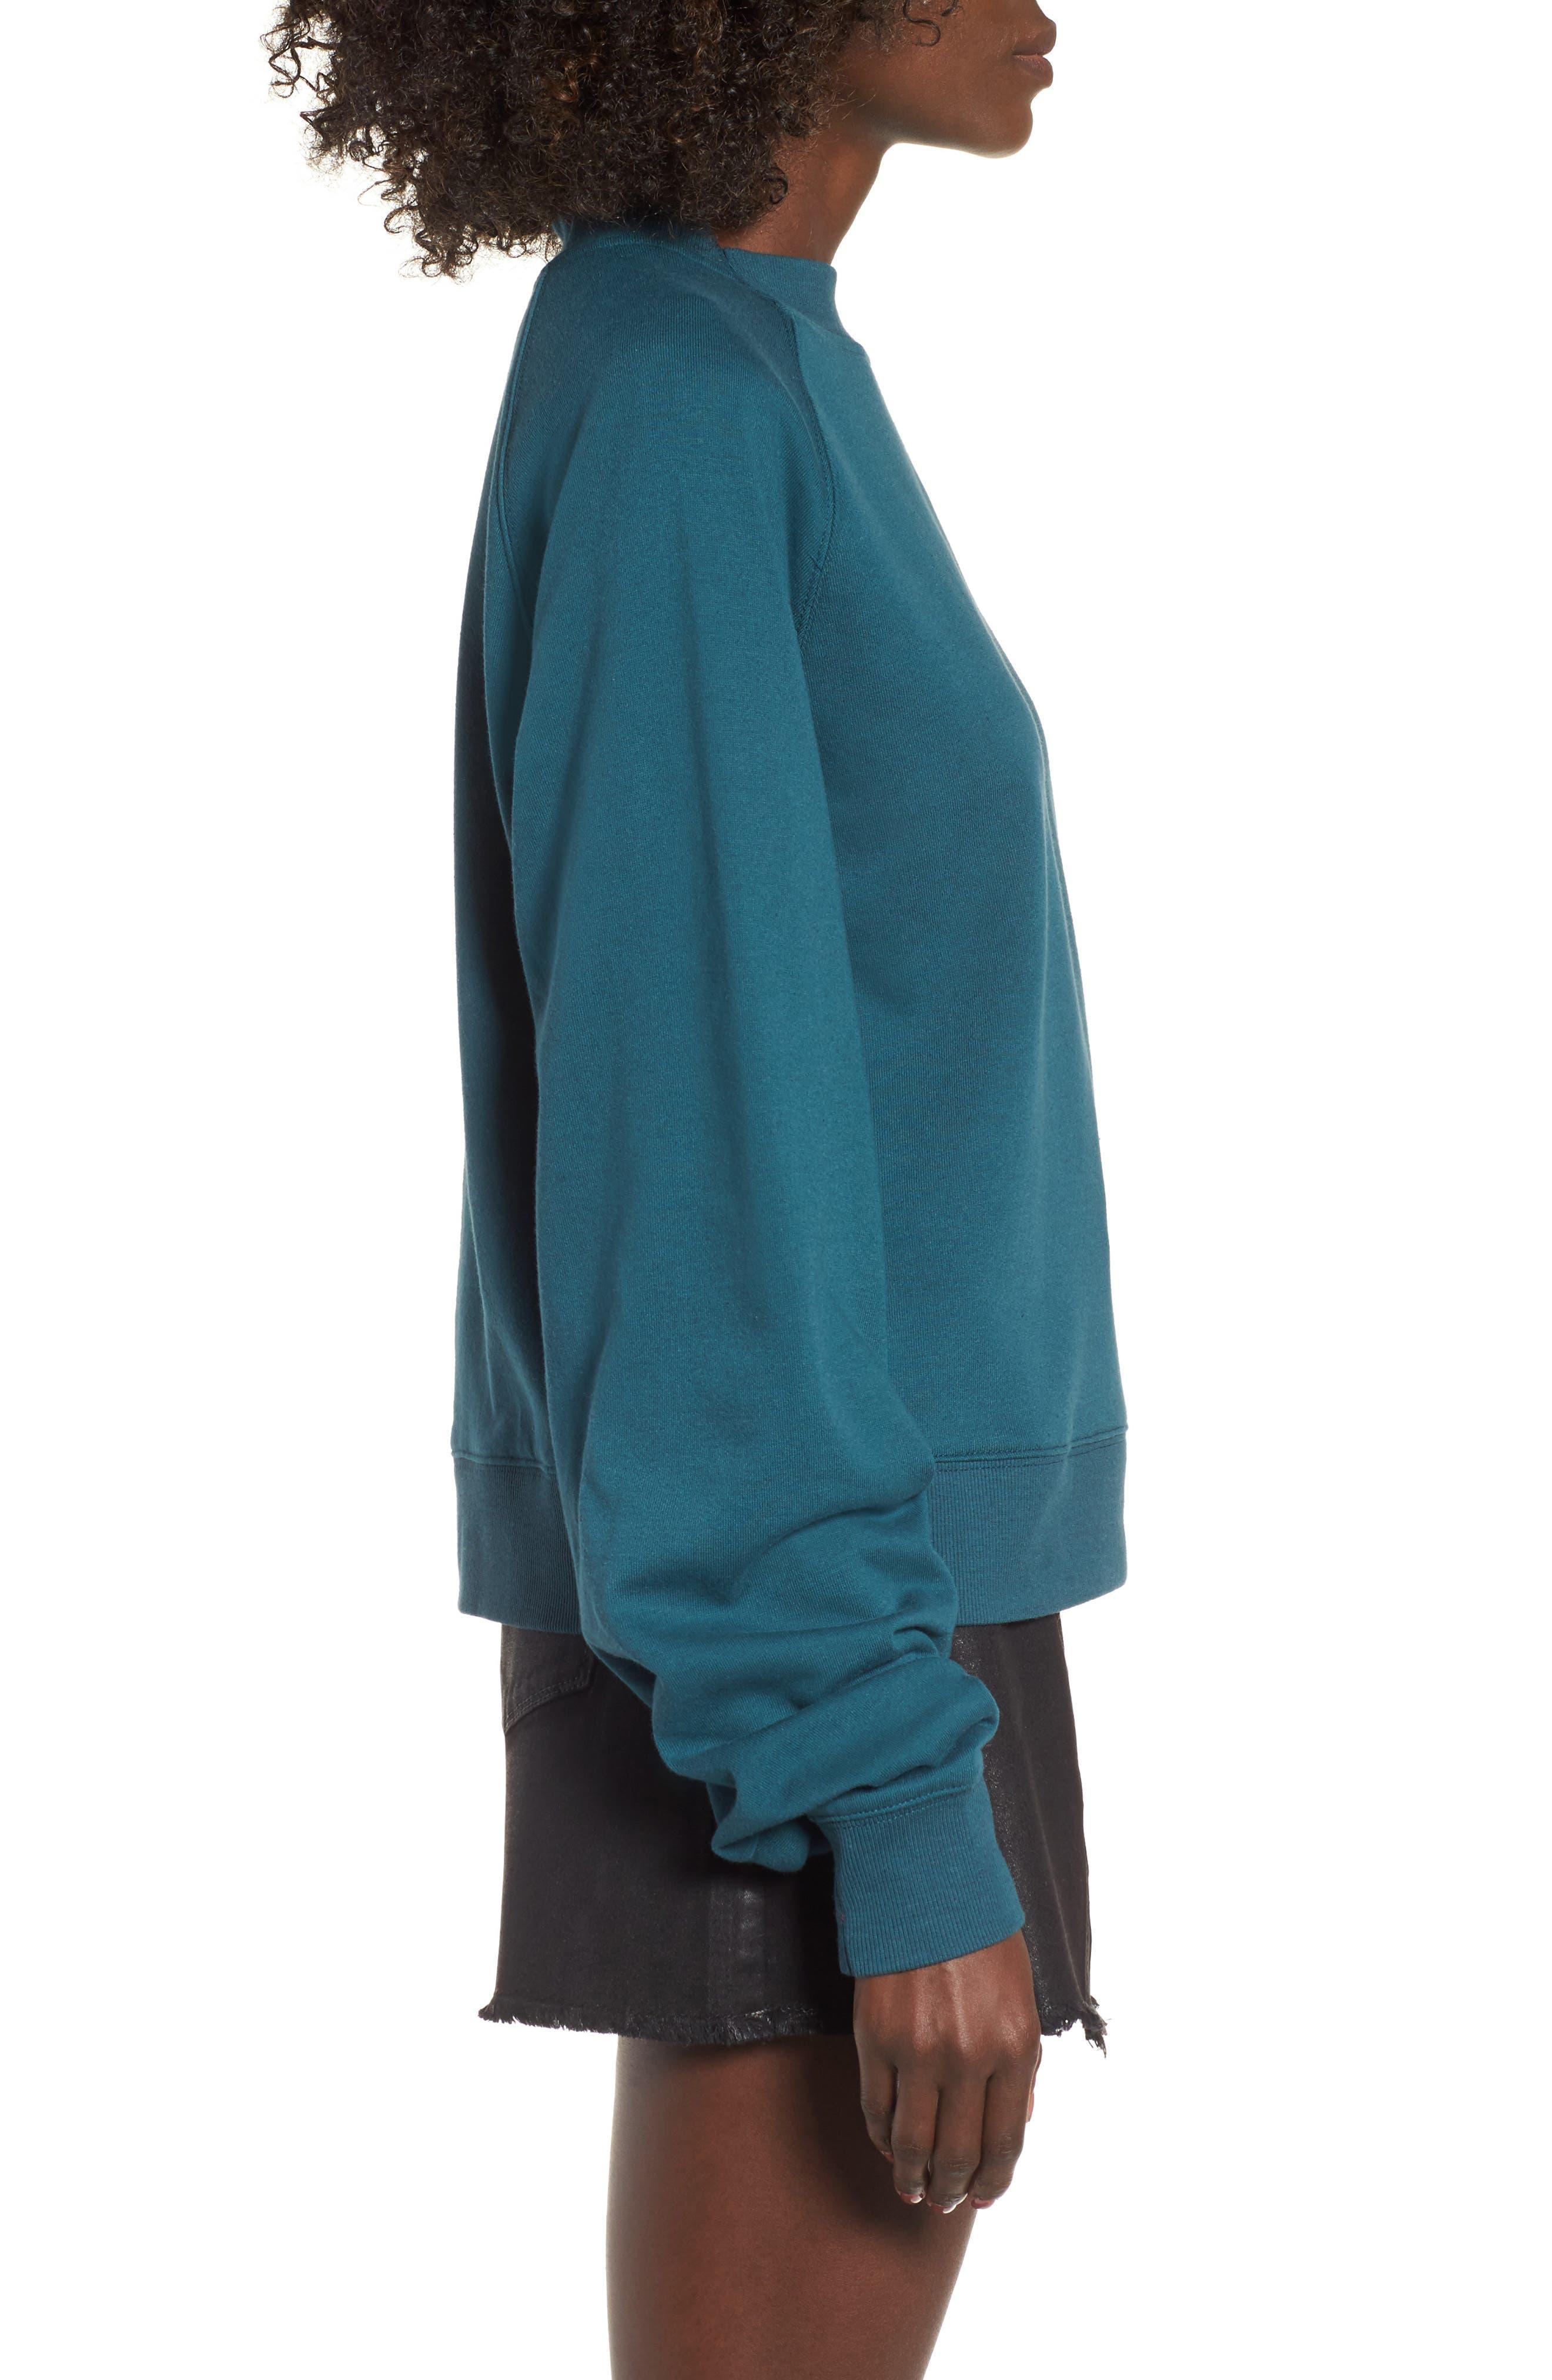 Cinched Sleeve Sweatshirt,                             Alternate thumbnail 3, color,                             Teal